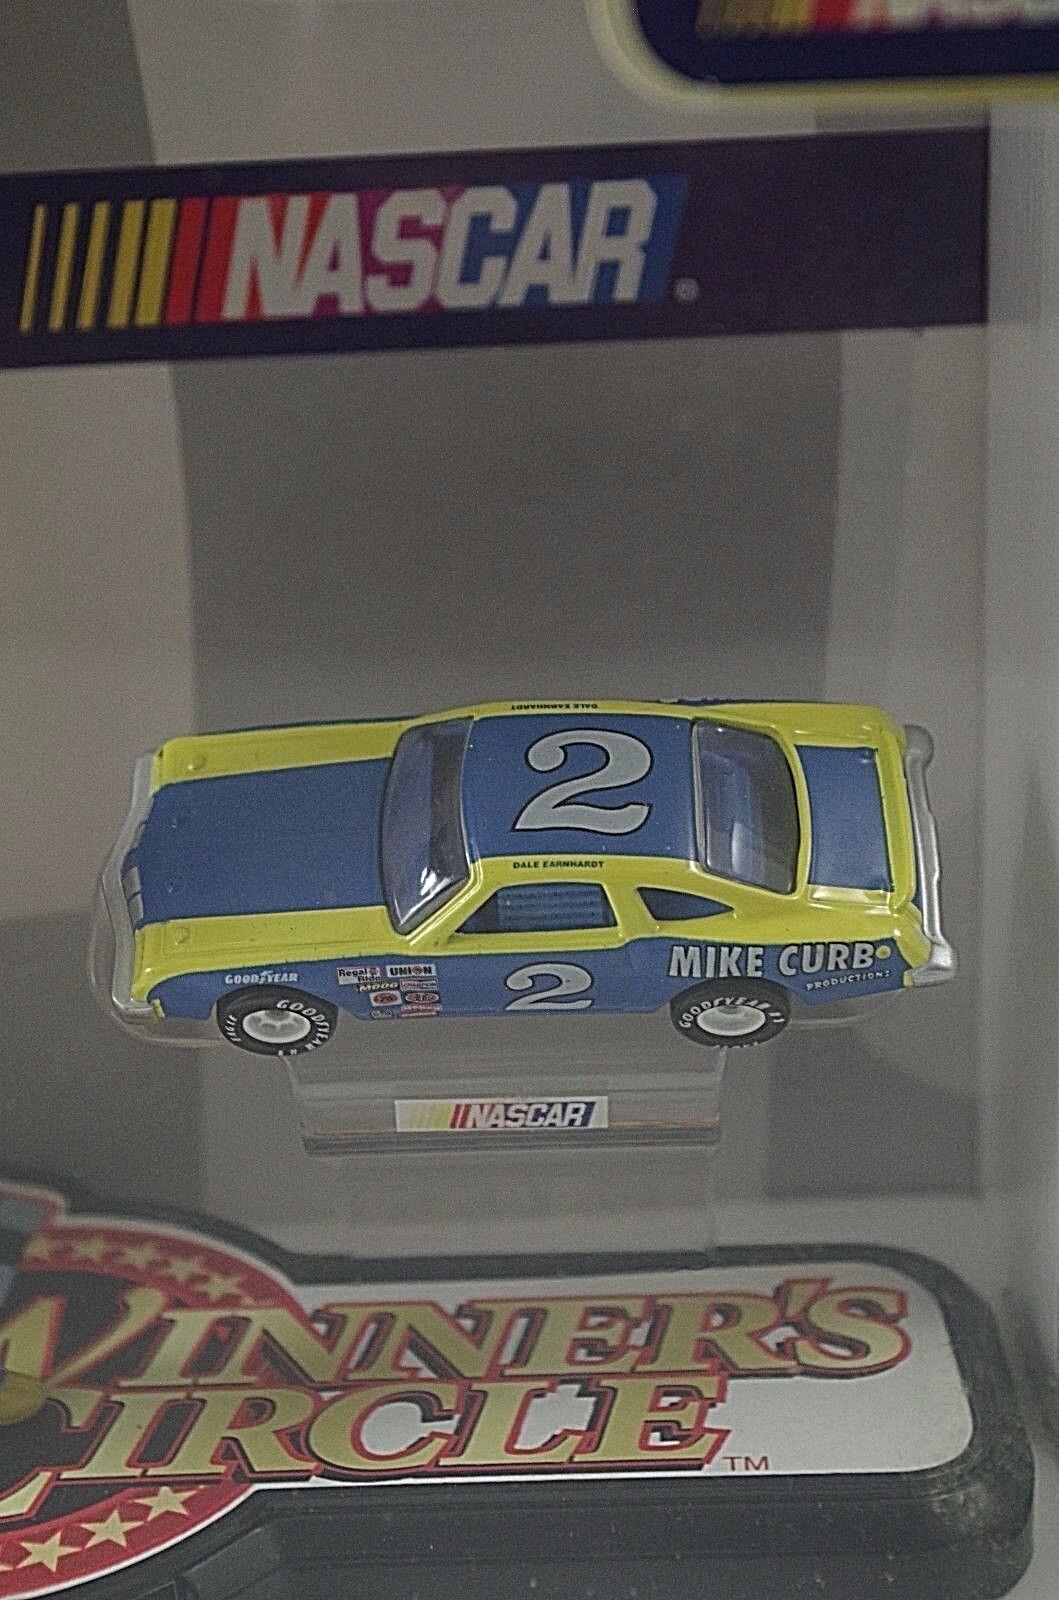 WINNERS CIRCLE 1980 DALE EARNHARDT MOST POPULAR DRIVERS FIGURINE 1 1 1 64 SCALE 5b2295